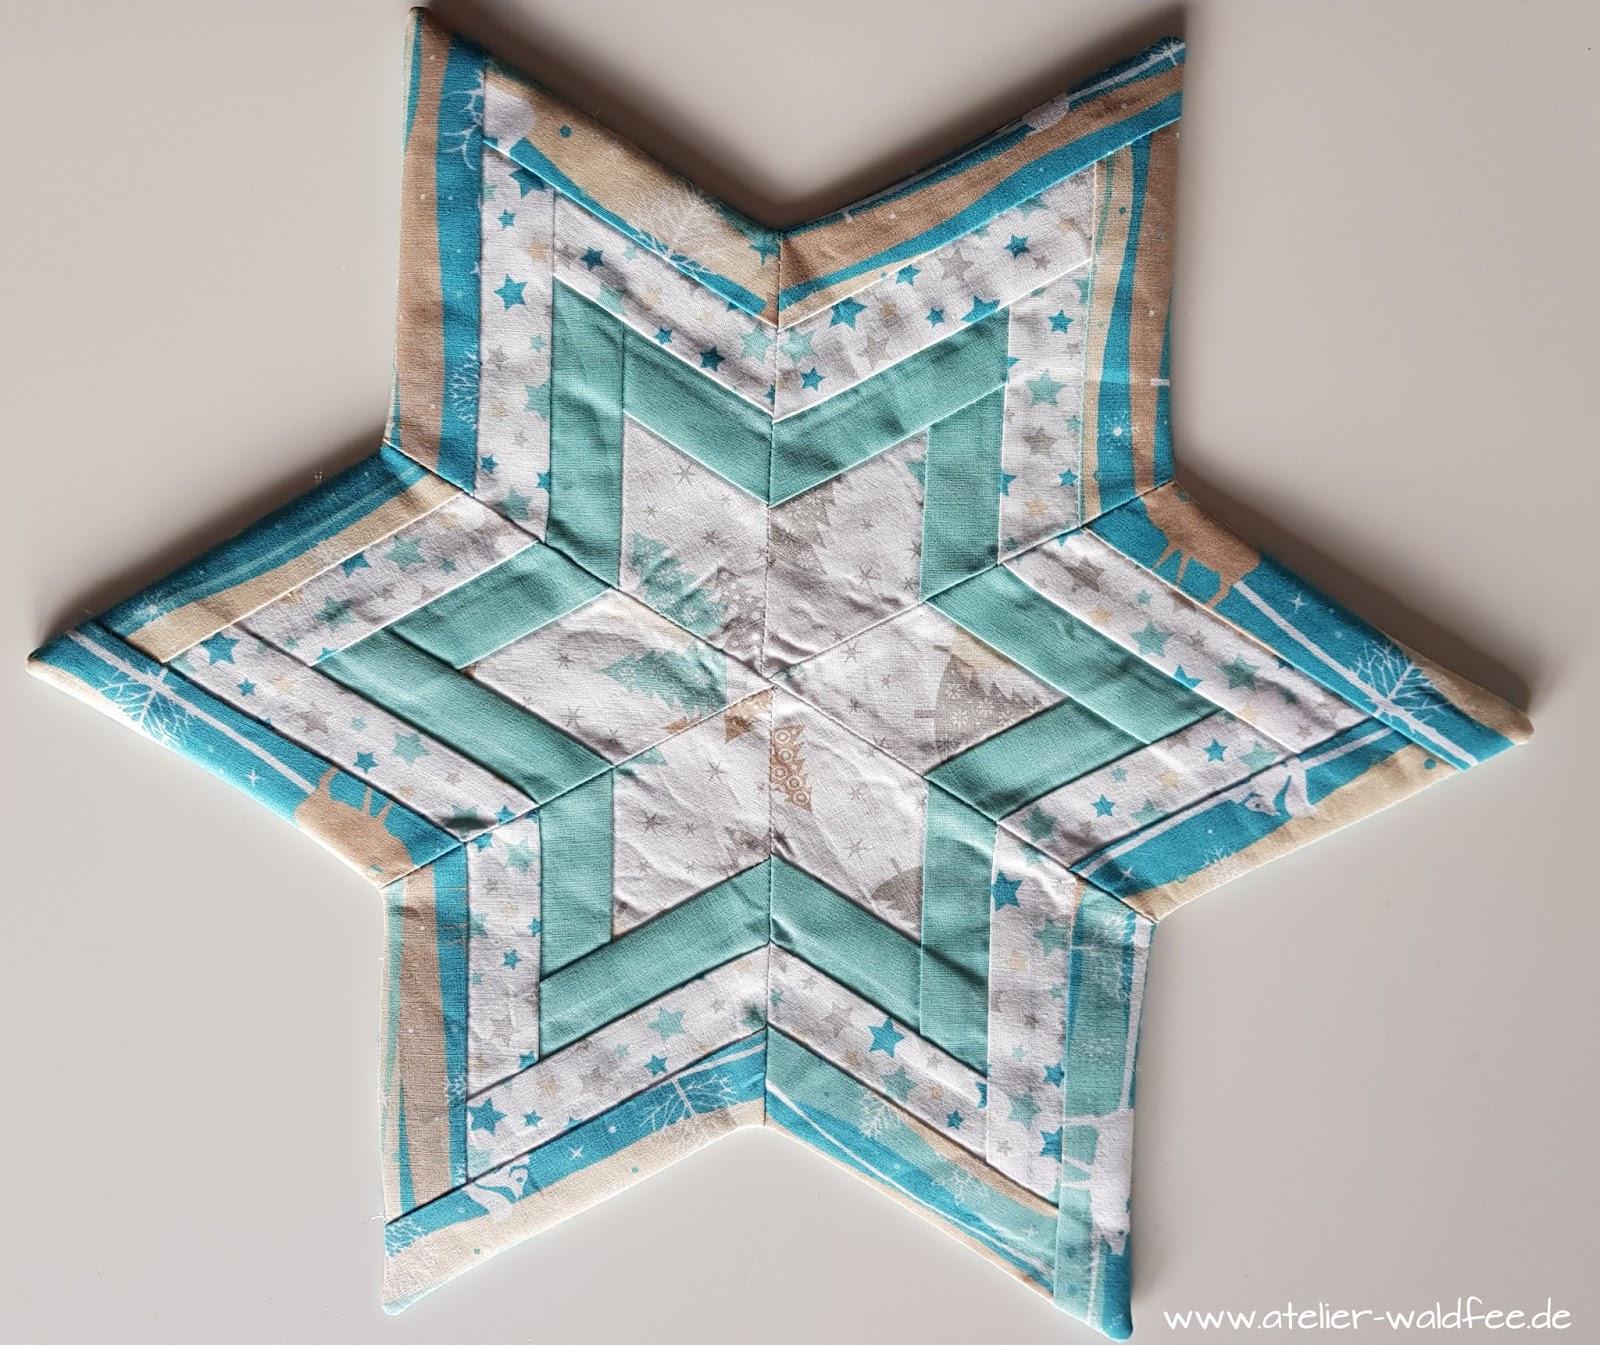 atelier waldfee weihnachts patchwork stern. Black Bedroom Furniture Sets. Home Design Ideas